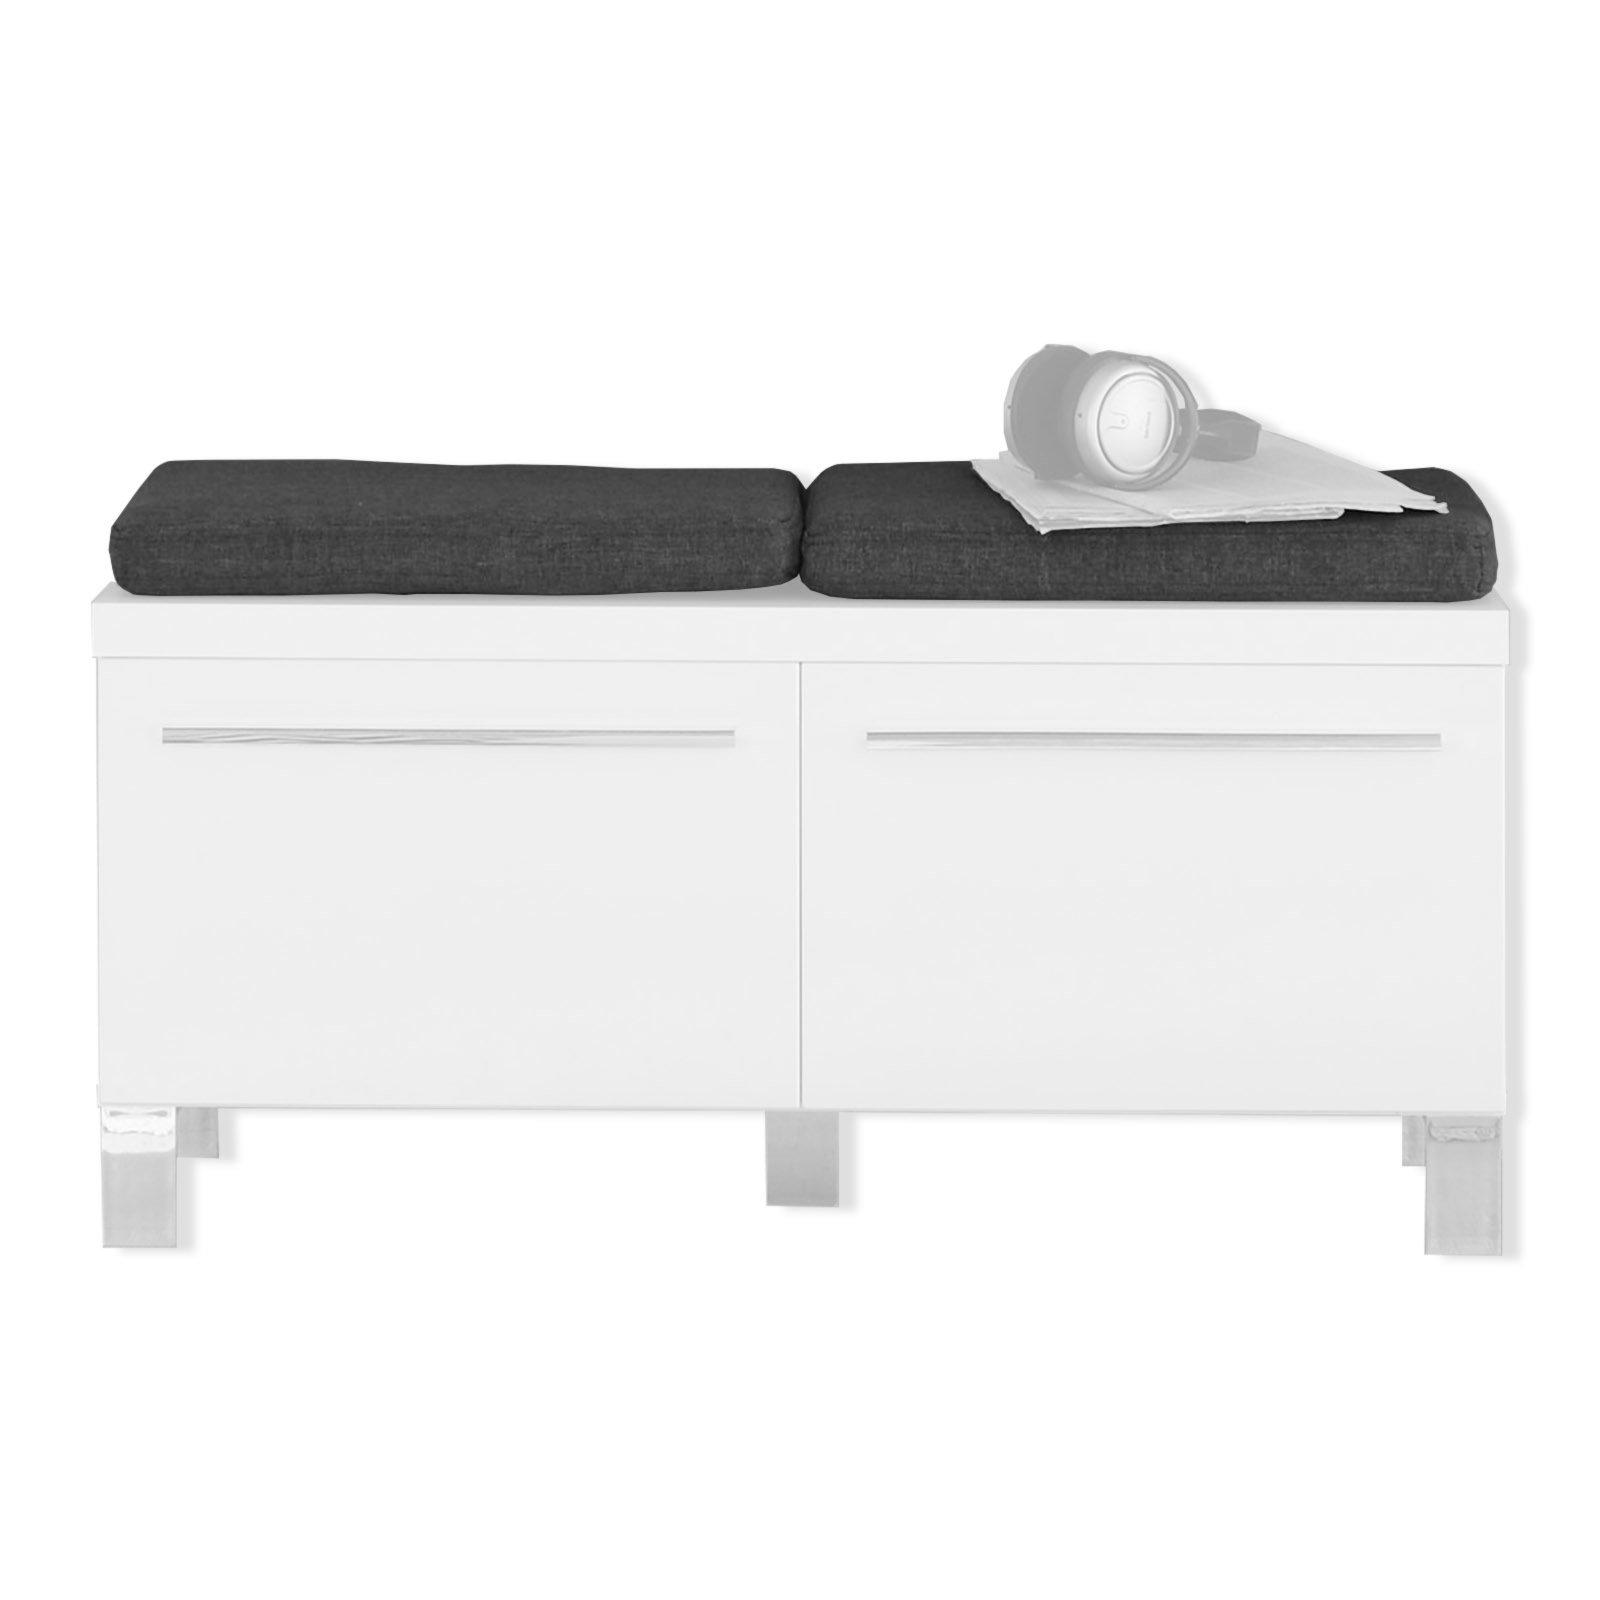 gnstige stuhlkissen simple linum stuhlkissen sitzkissen gesteppt osby karo trkis blau c sparset. Black Bedroom Furniture Sets. Home Design Ideas